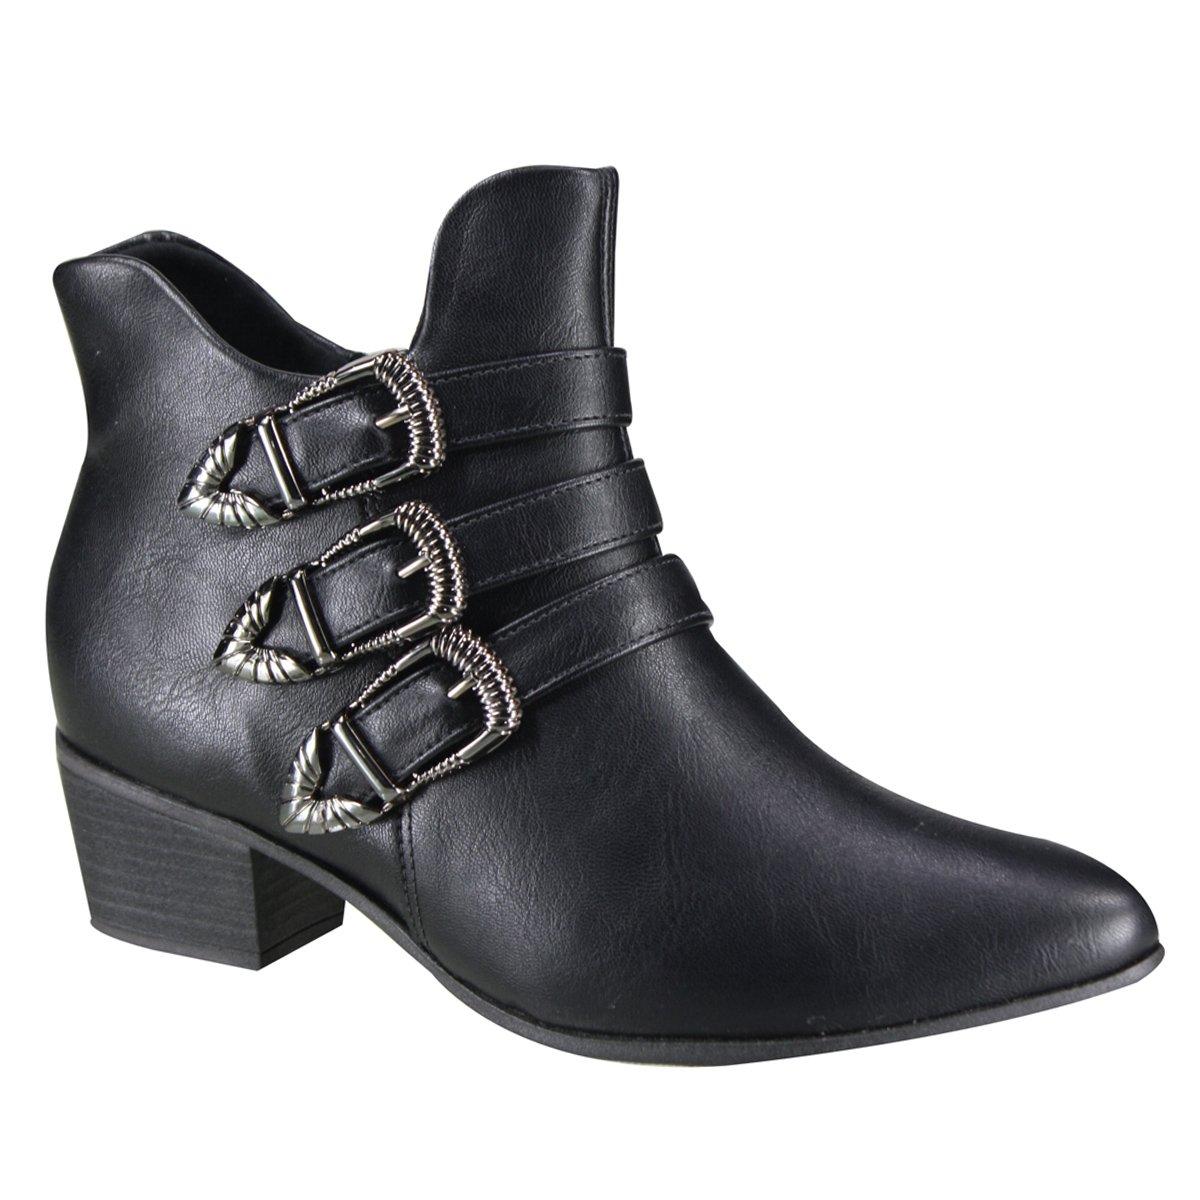 62381b860b4 Bota Ramarim Ankle Boot Feminina 19-59104 000001 - Preto (Vestuário ...